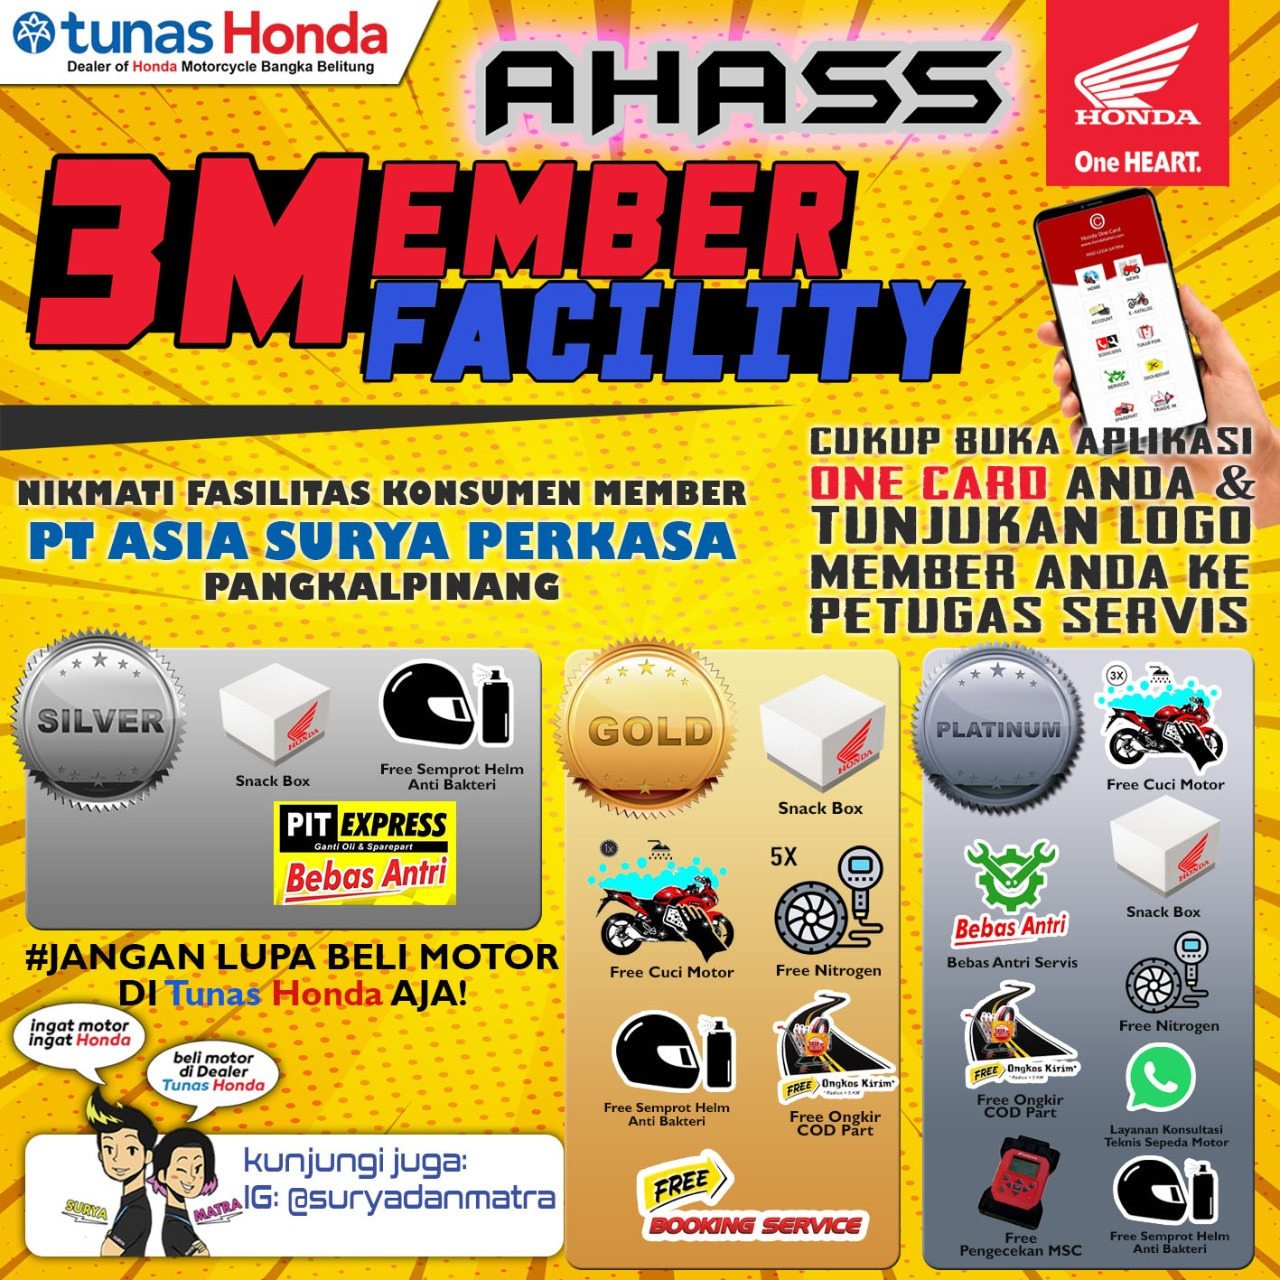 Dealer Resmi Honda yg berlamat di Jl. A. Yani No. 147 Pangkal Pinang Meluncurkan loyality program bernama 3 Member Reward untuk Konsumen Dealer ASP PKP.